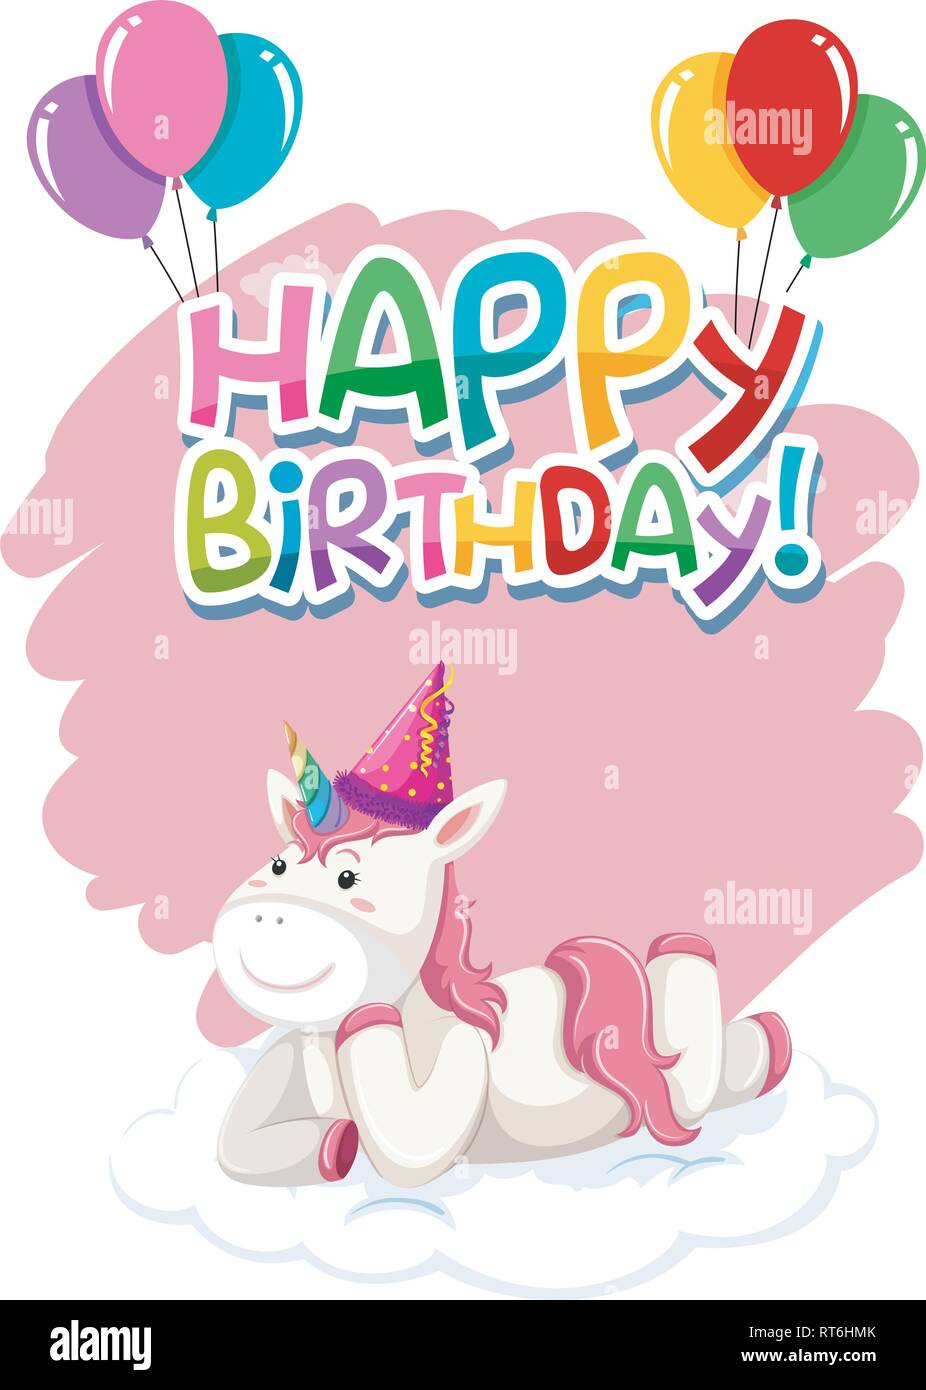 https www alamy com a cute unicorn happy birthday icon illustration image238632147 html